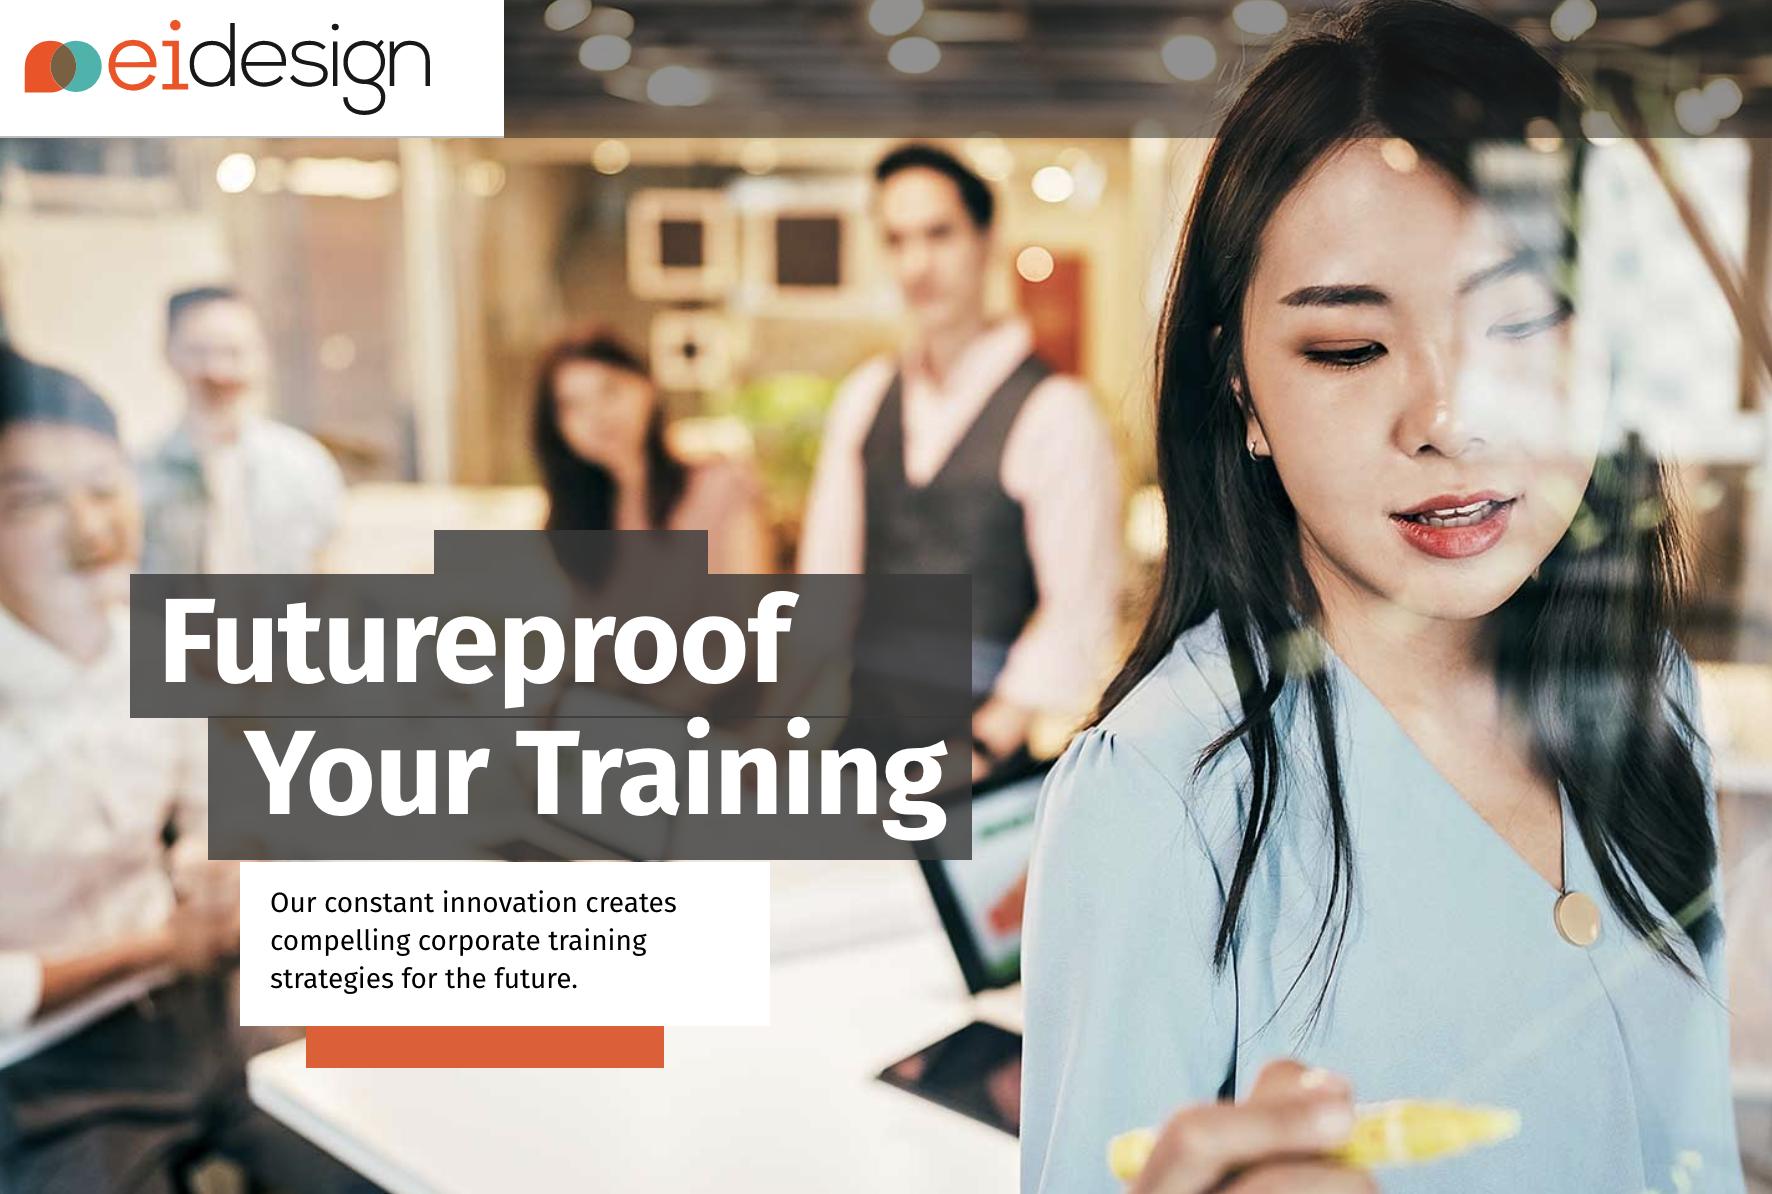 eidesign Corporate E Learning Solution